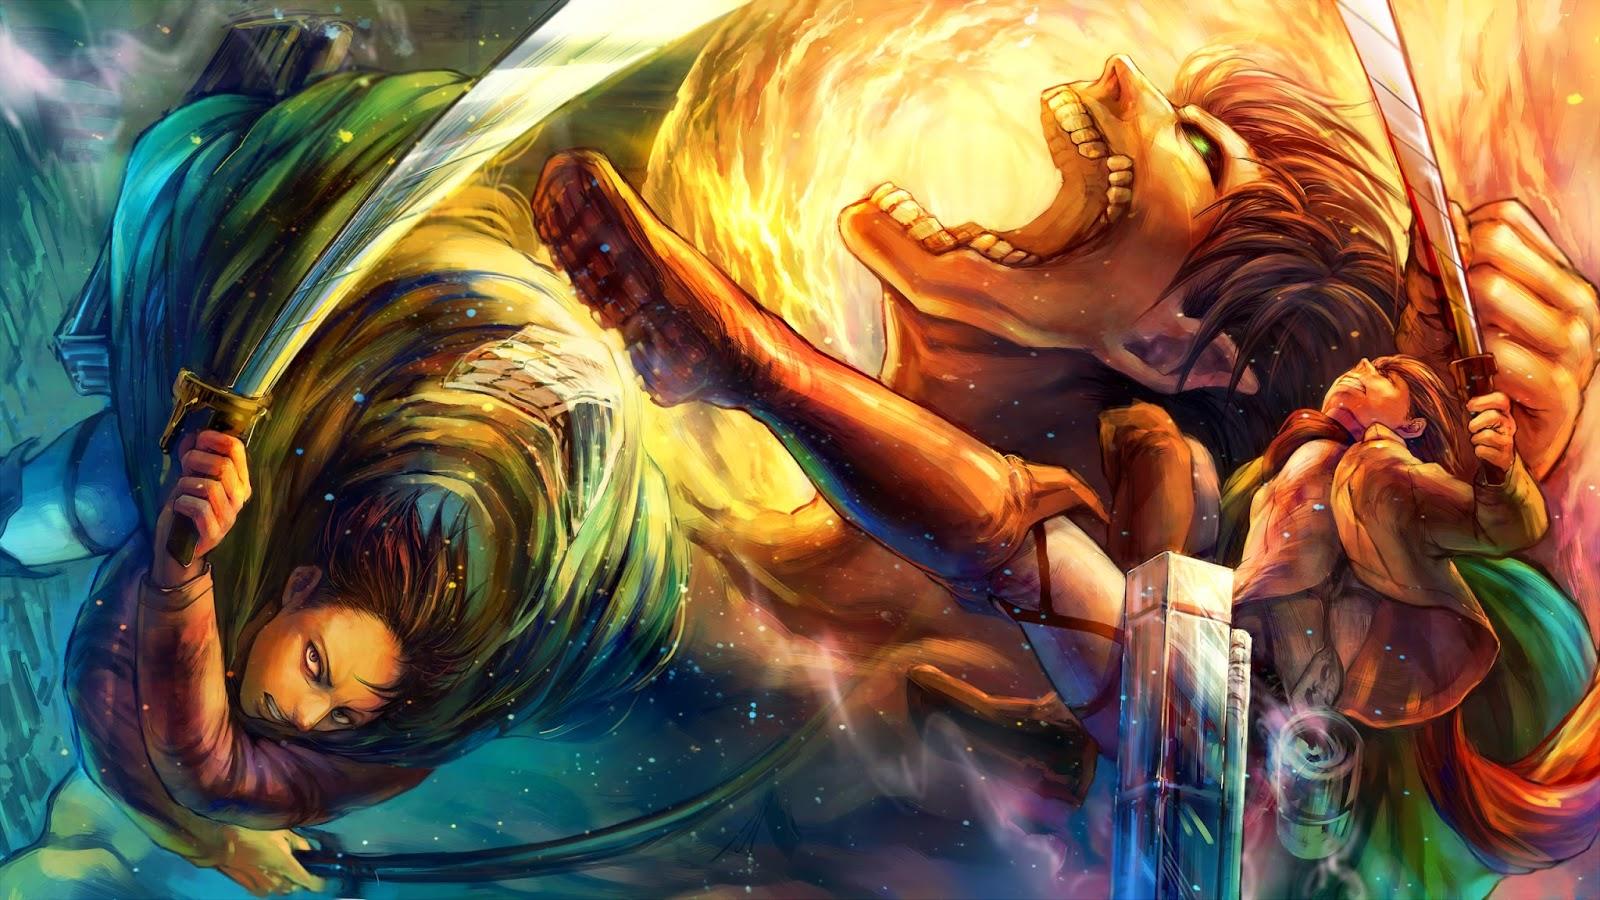 Rogue-Titan-eren-Jaeger-Levi-Cape-Attack-on-Titan-Shingeki-no-Kyojin ... Attack On Titan Survey Corps Iphone Wallpaper